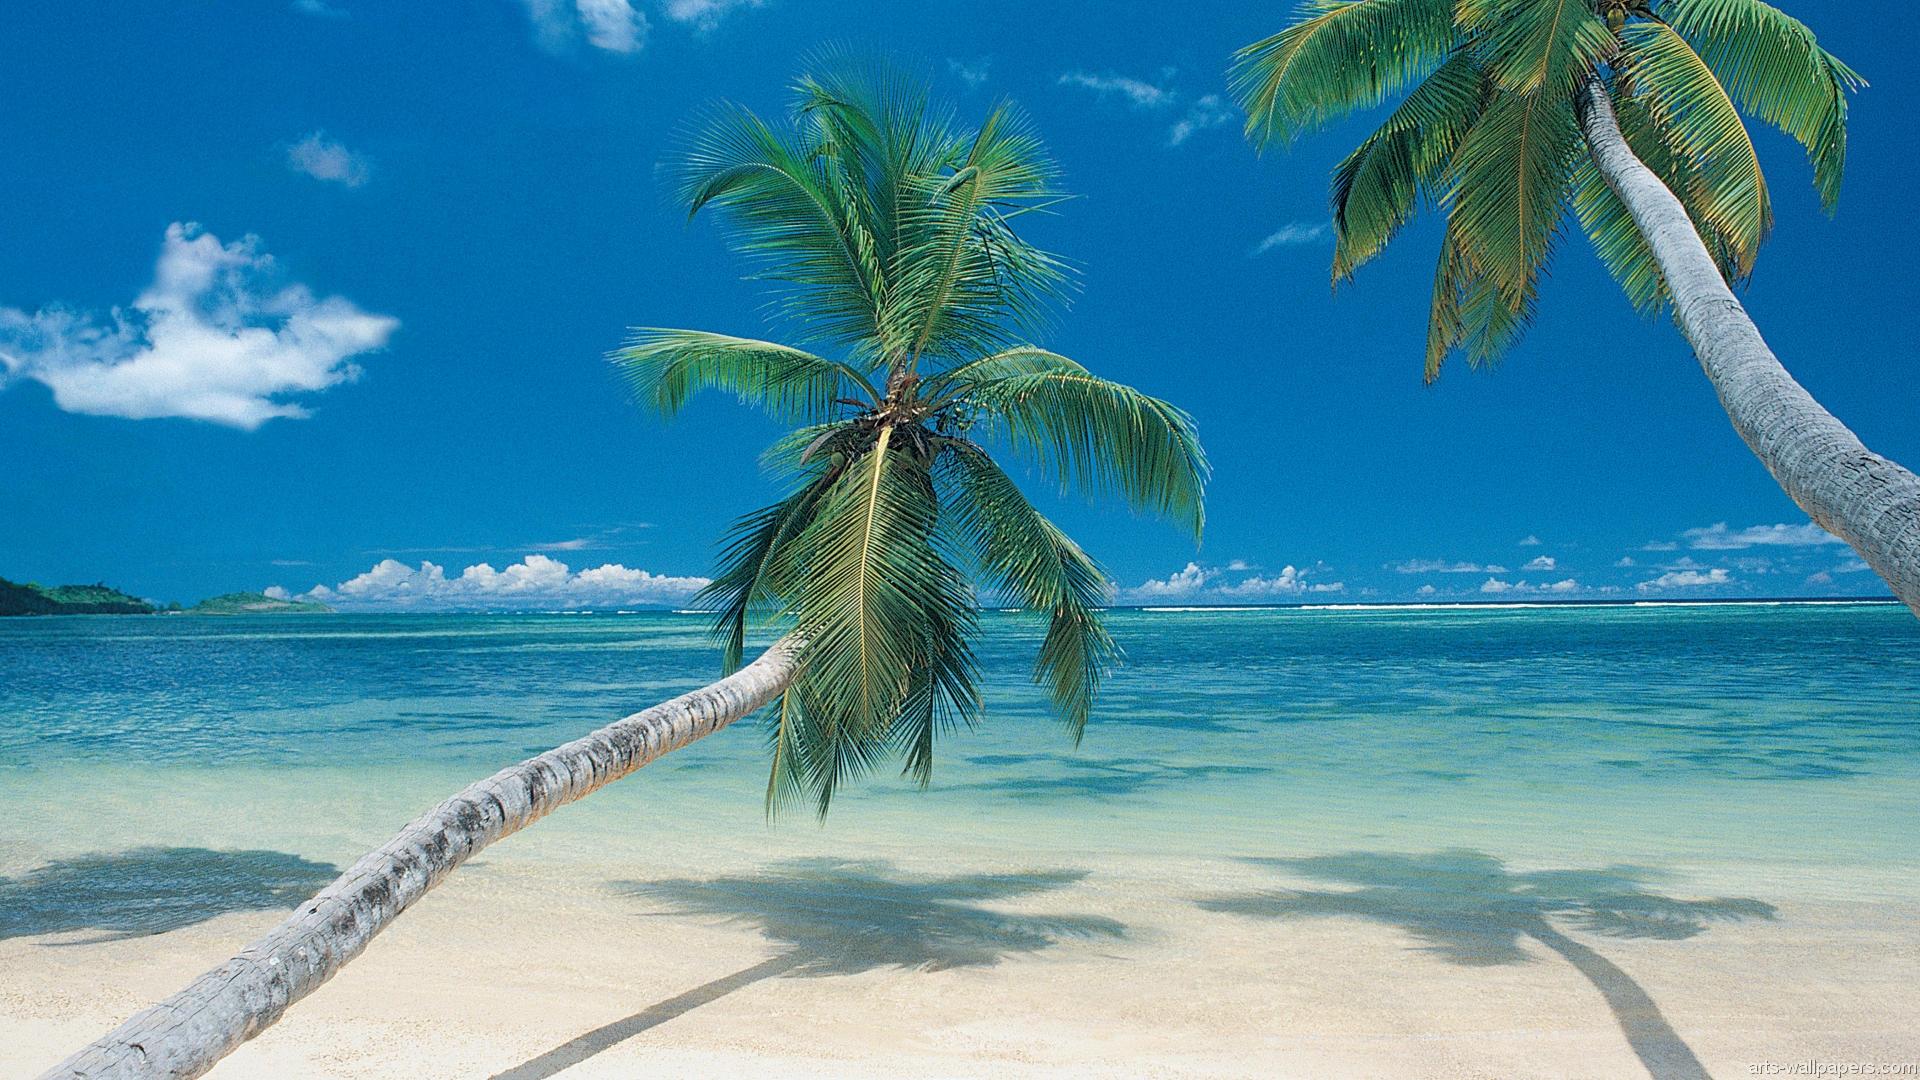 Hammock Beach Palms Paradise Tokomo Pics 1920x1080